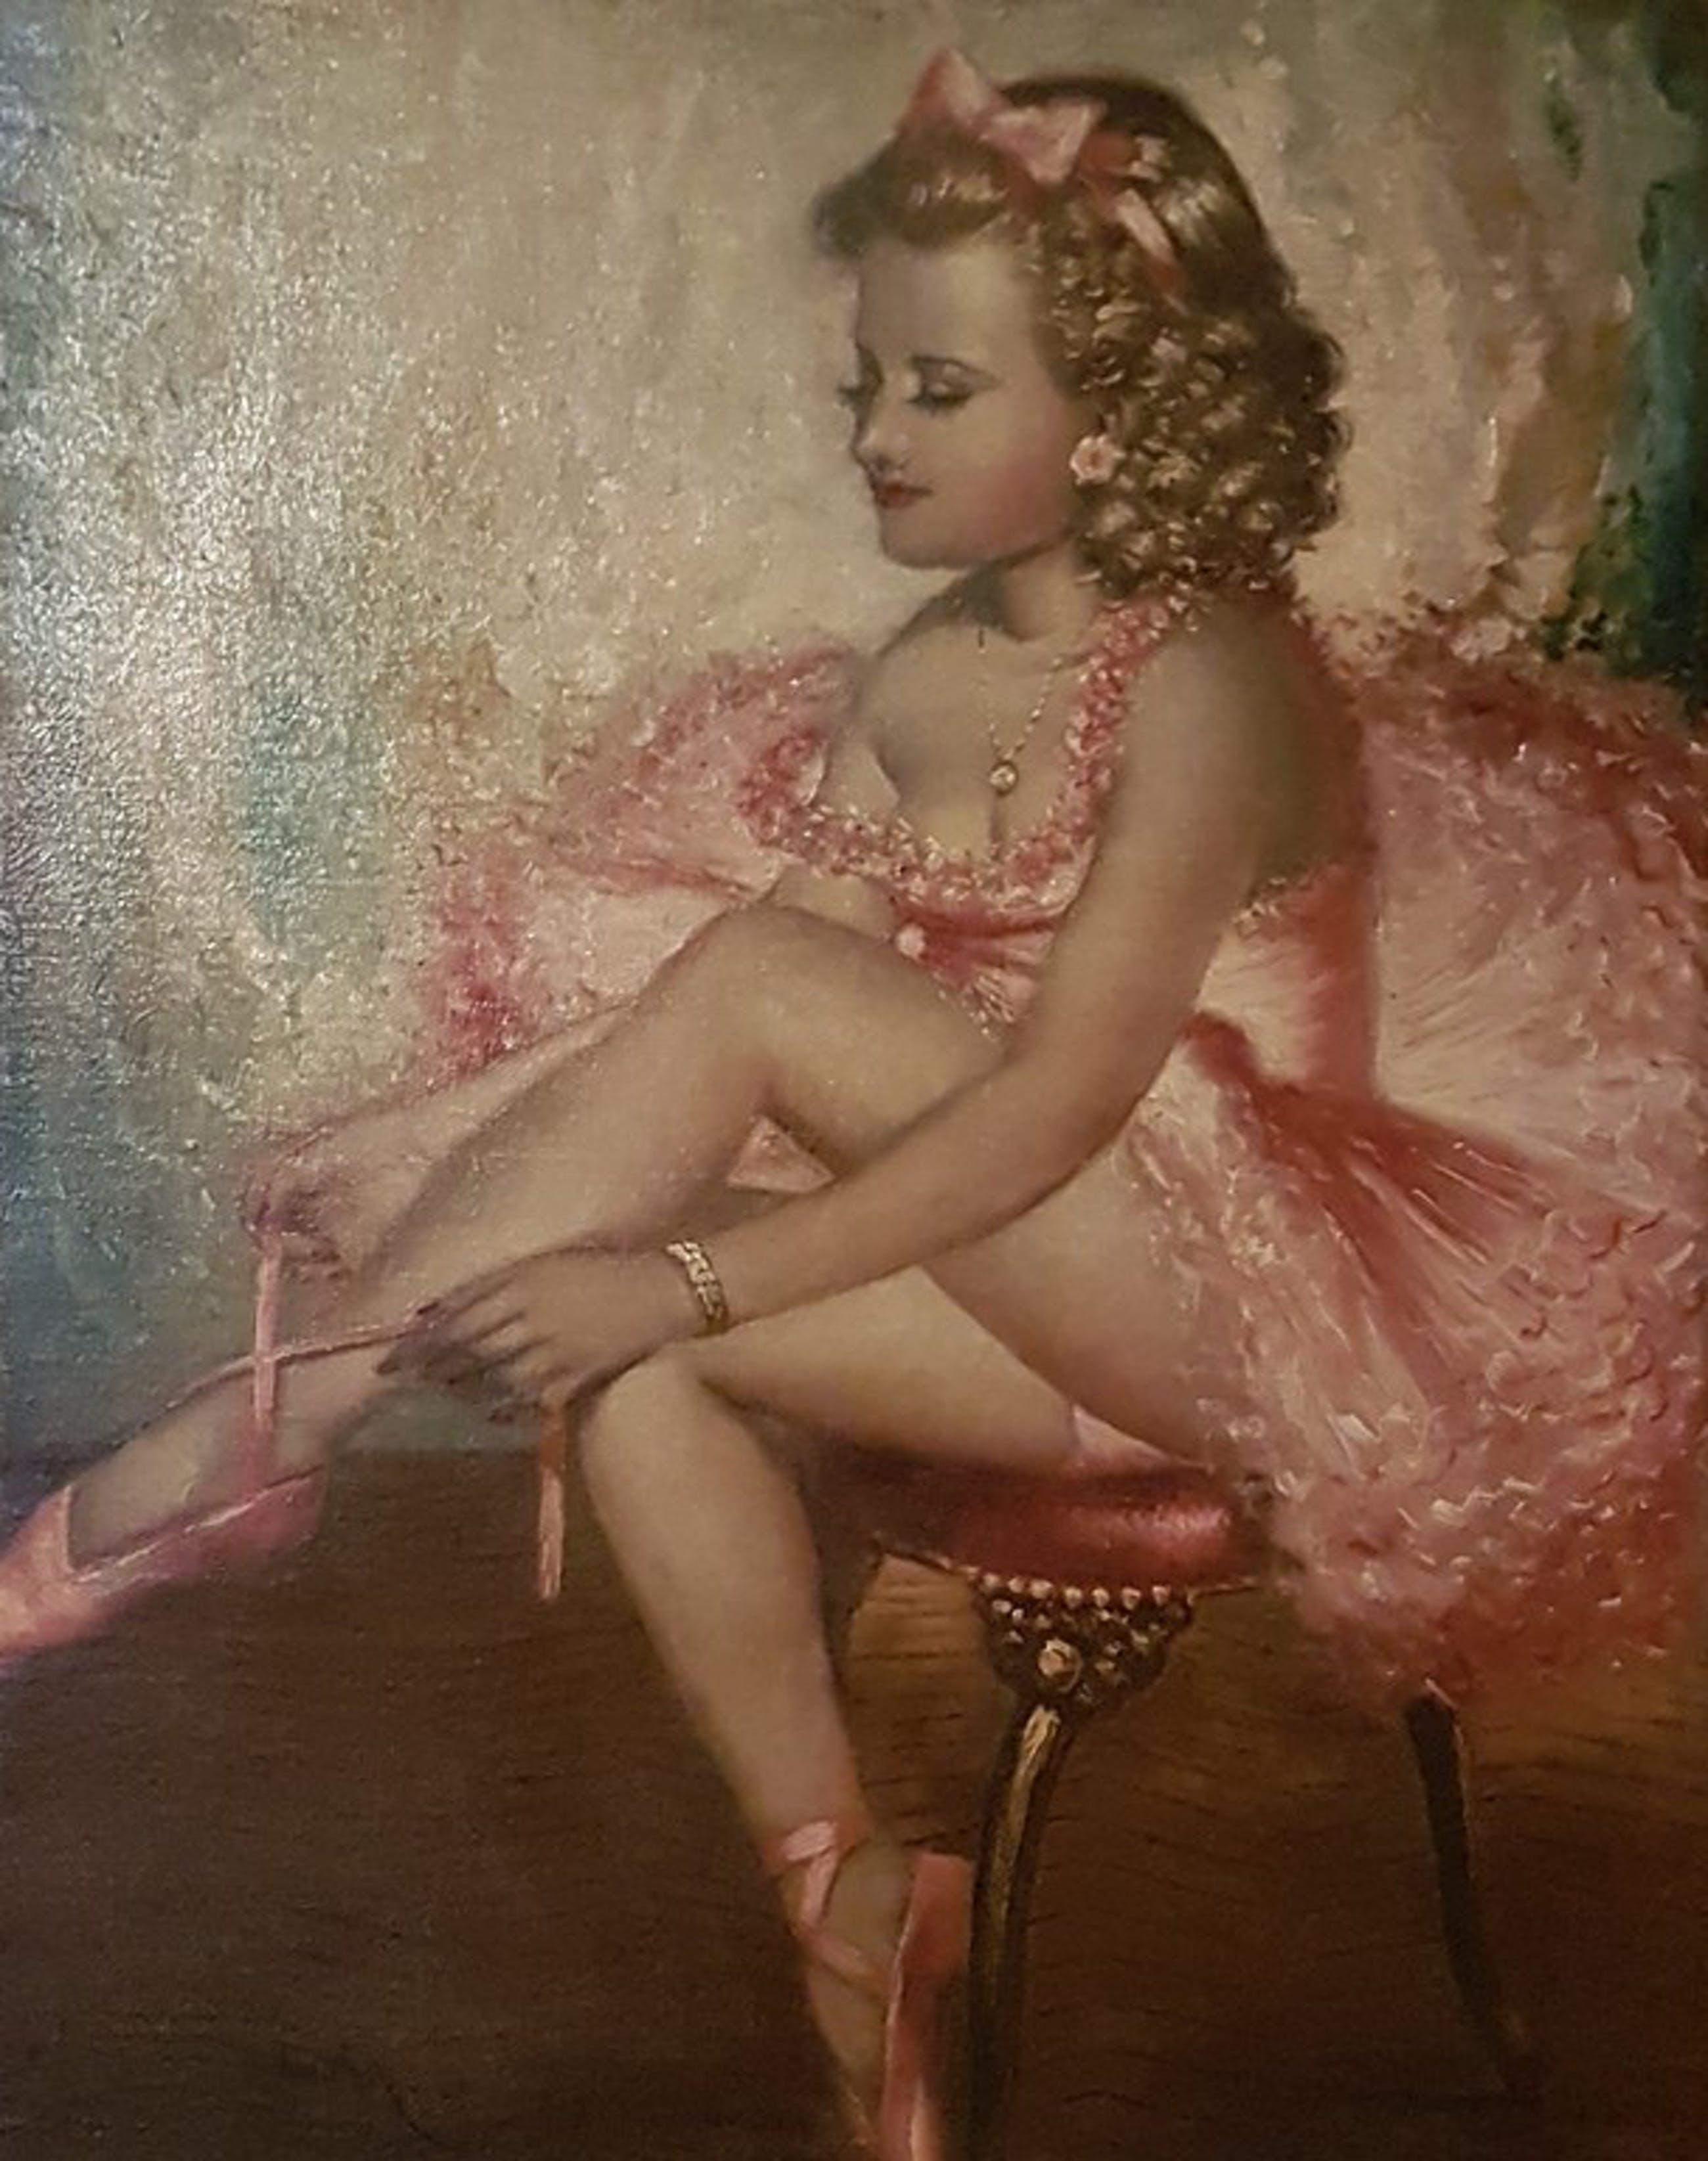 Pal Fried - Ballerina - olieverf op doek kopen? Bied vanaf 2300!